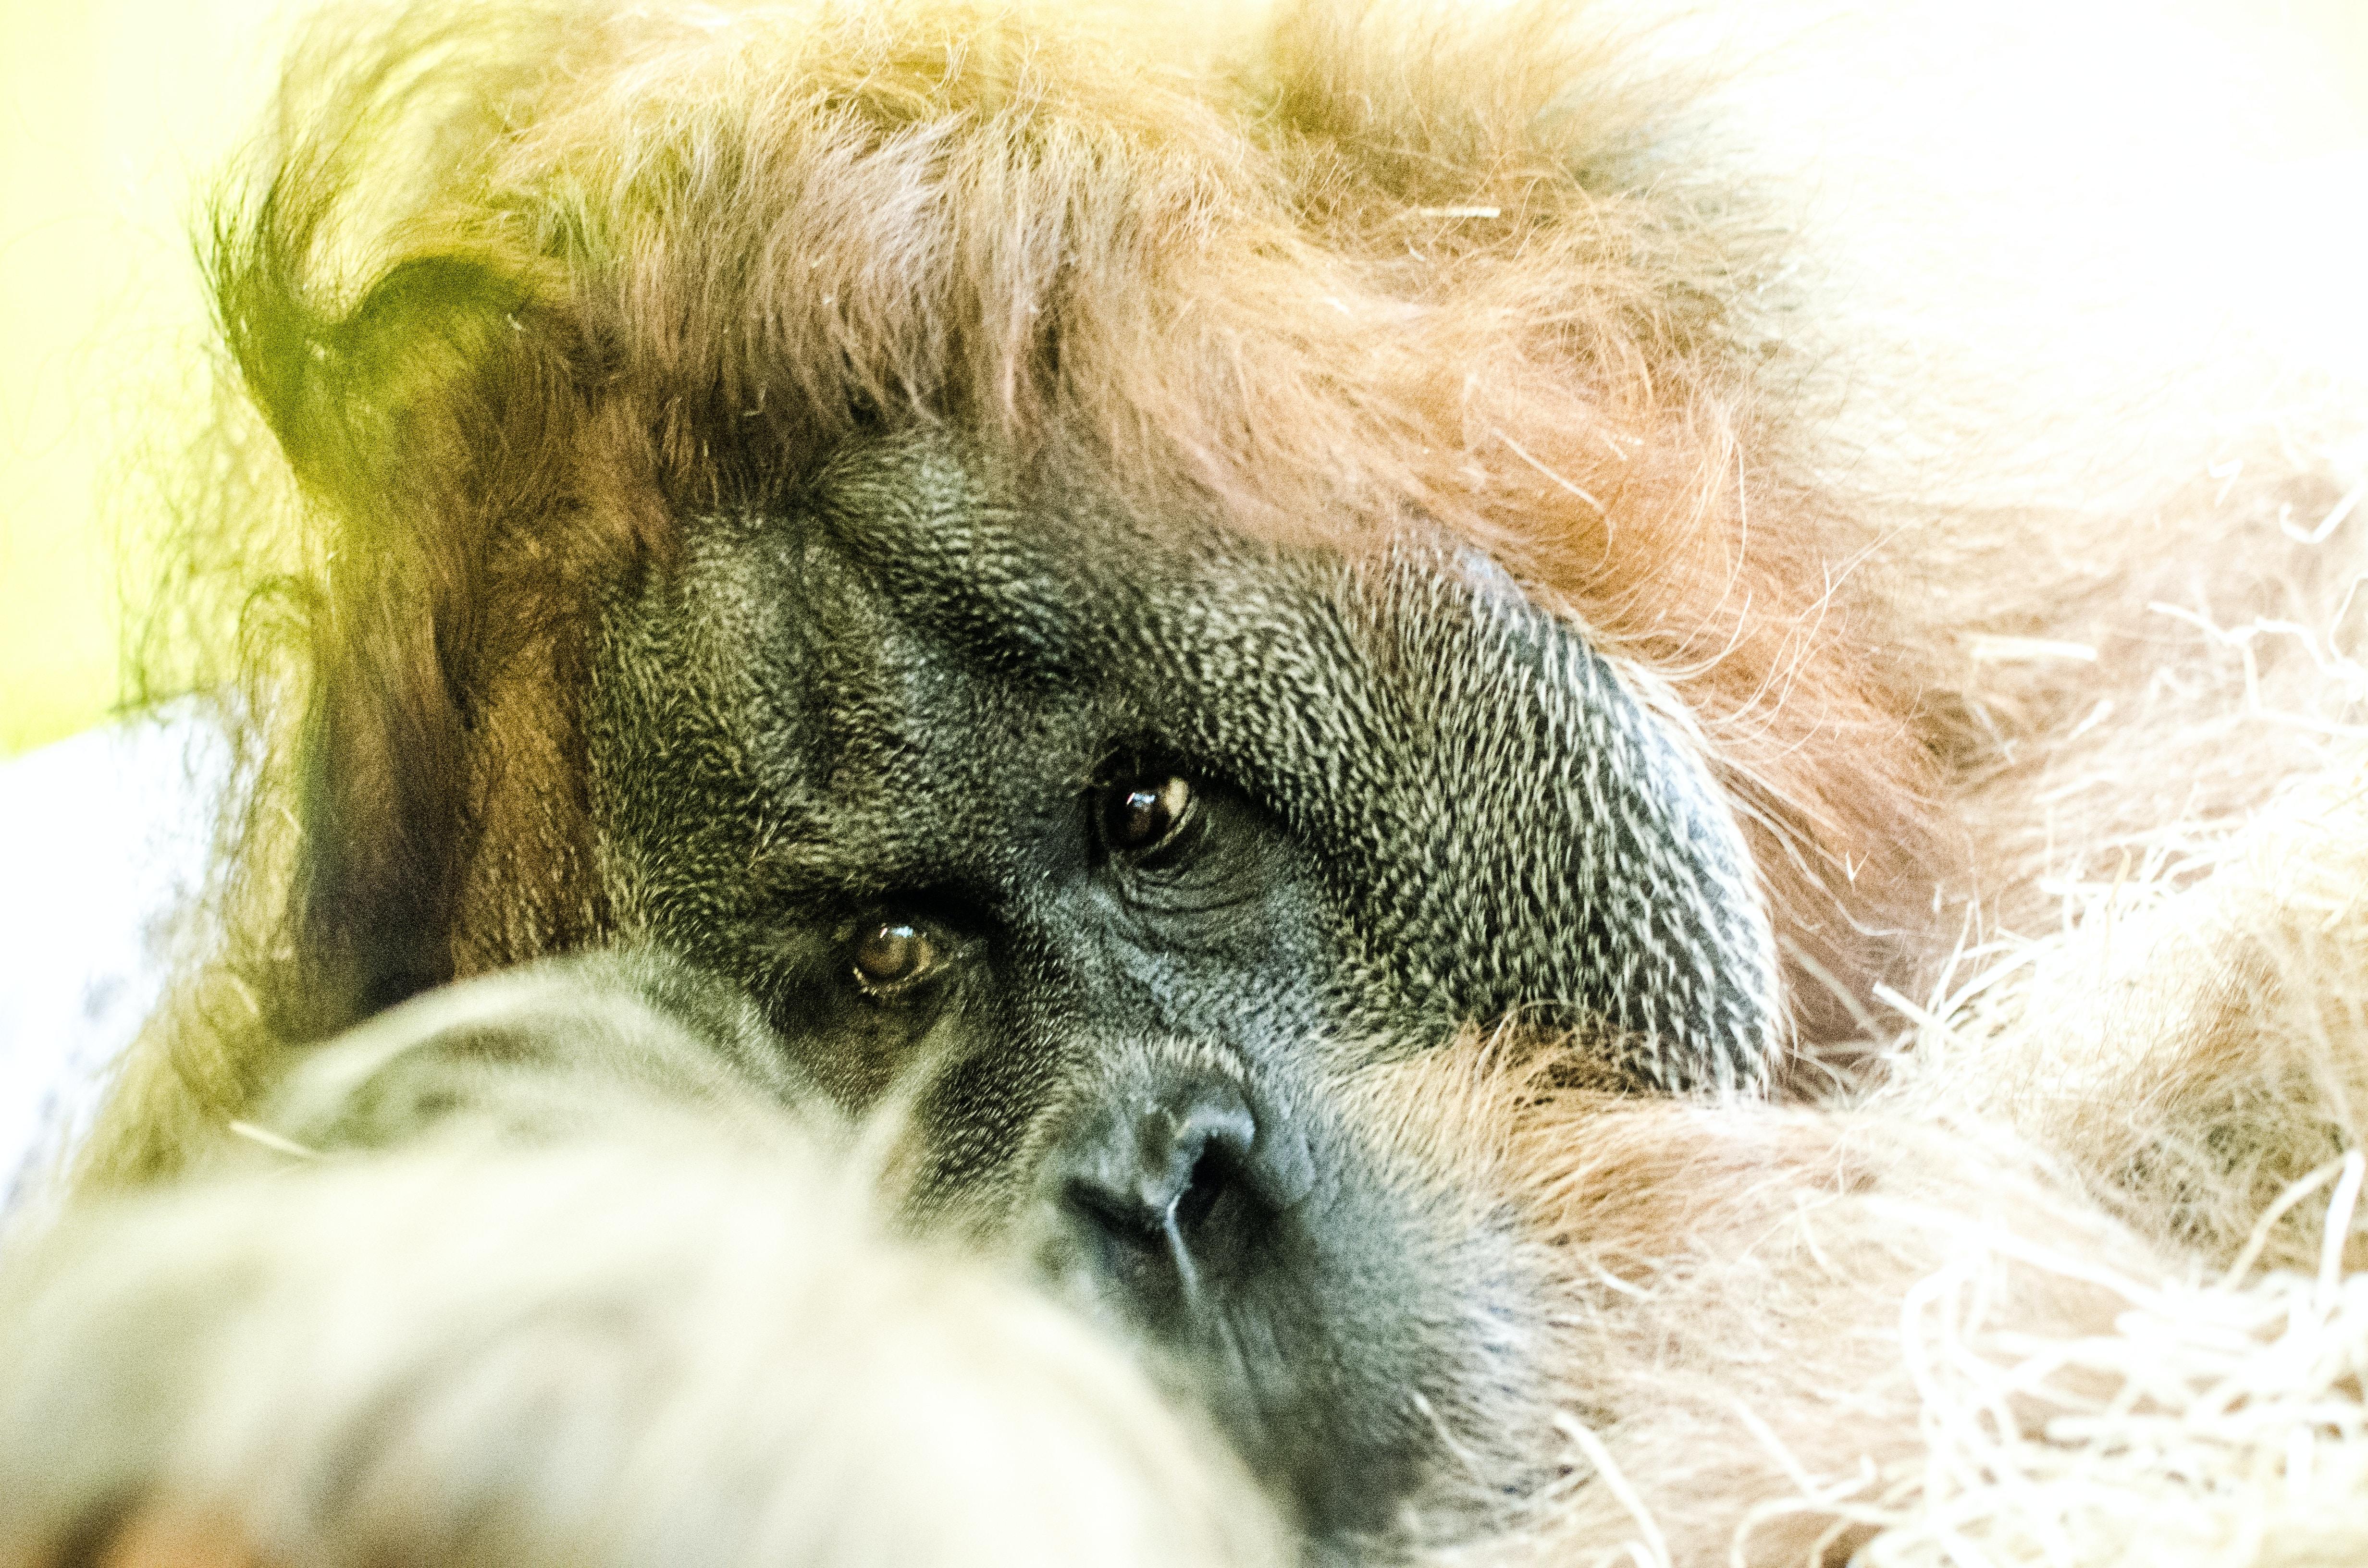 Macro of an orangutan